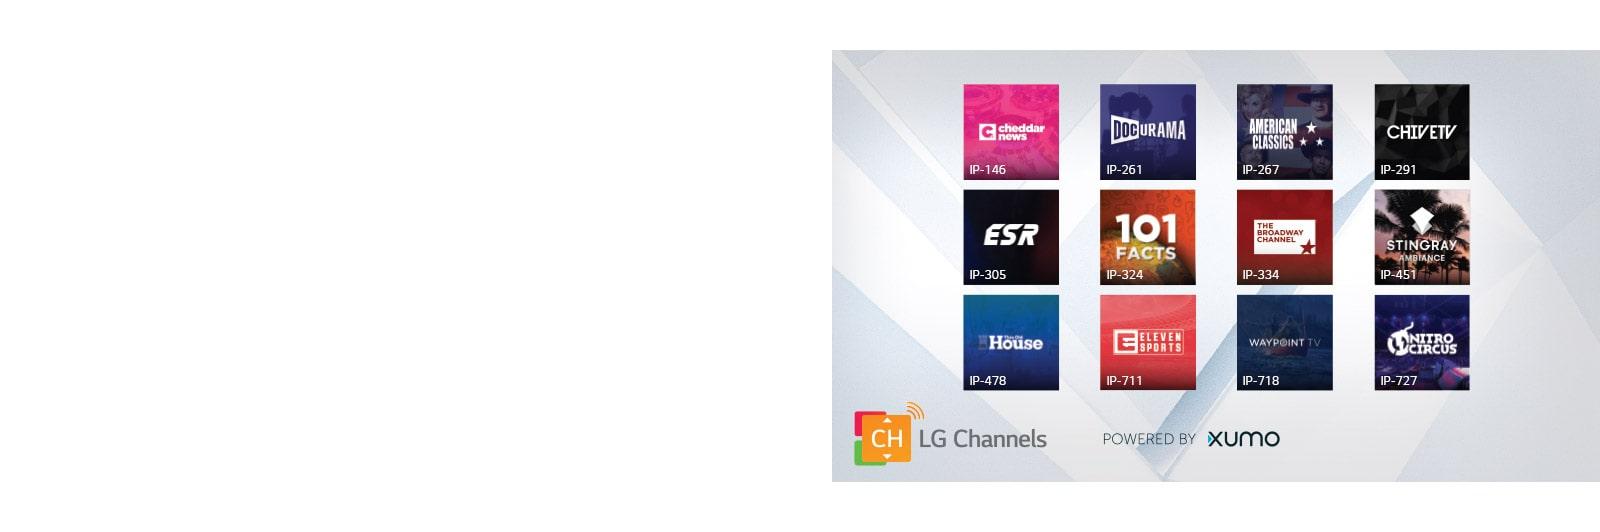 Miniaturas de 12 títulos de LG Channels